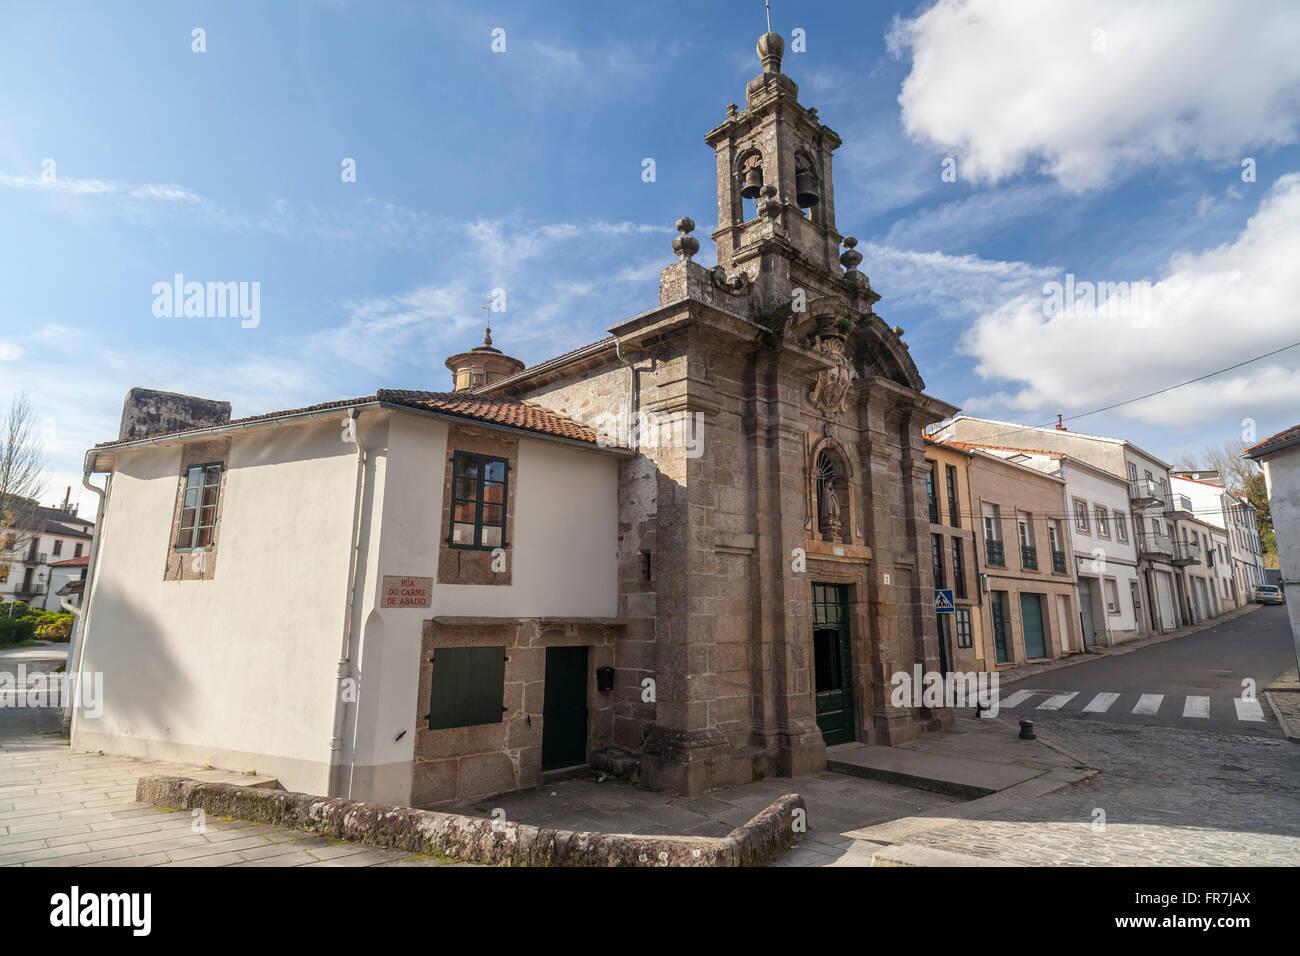 Santiago de Compostela. - Stock Image